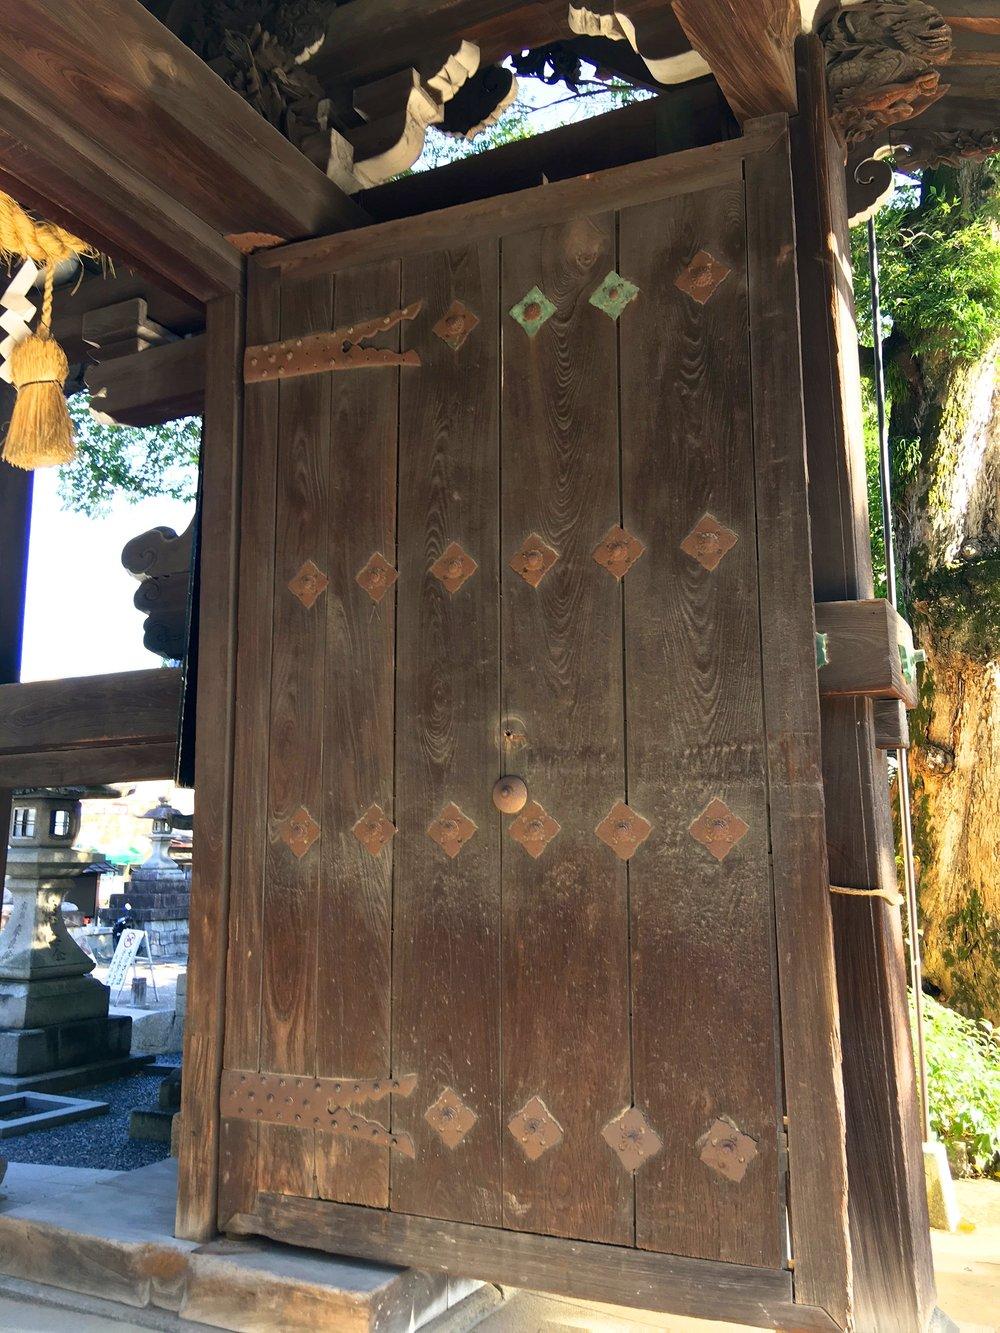 teri_Japan_Kyoto_Shrine_spiritedtable_photo02.jpg